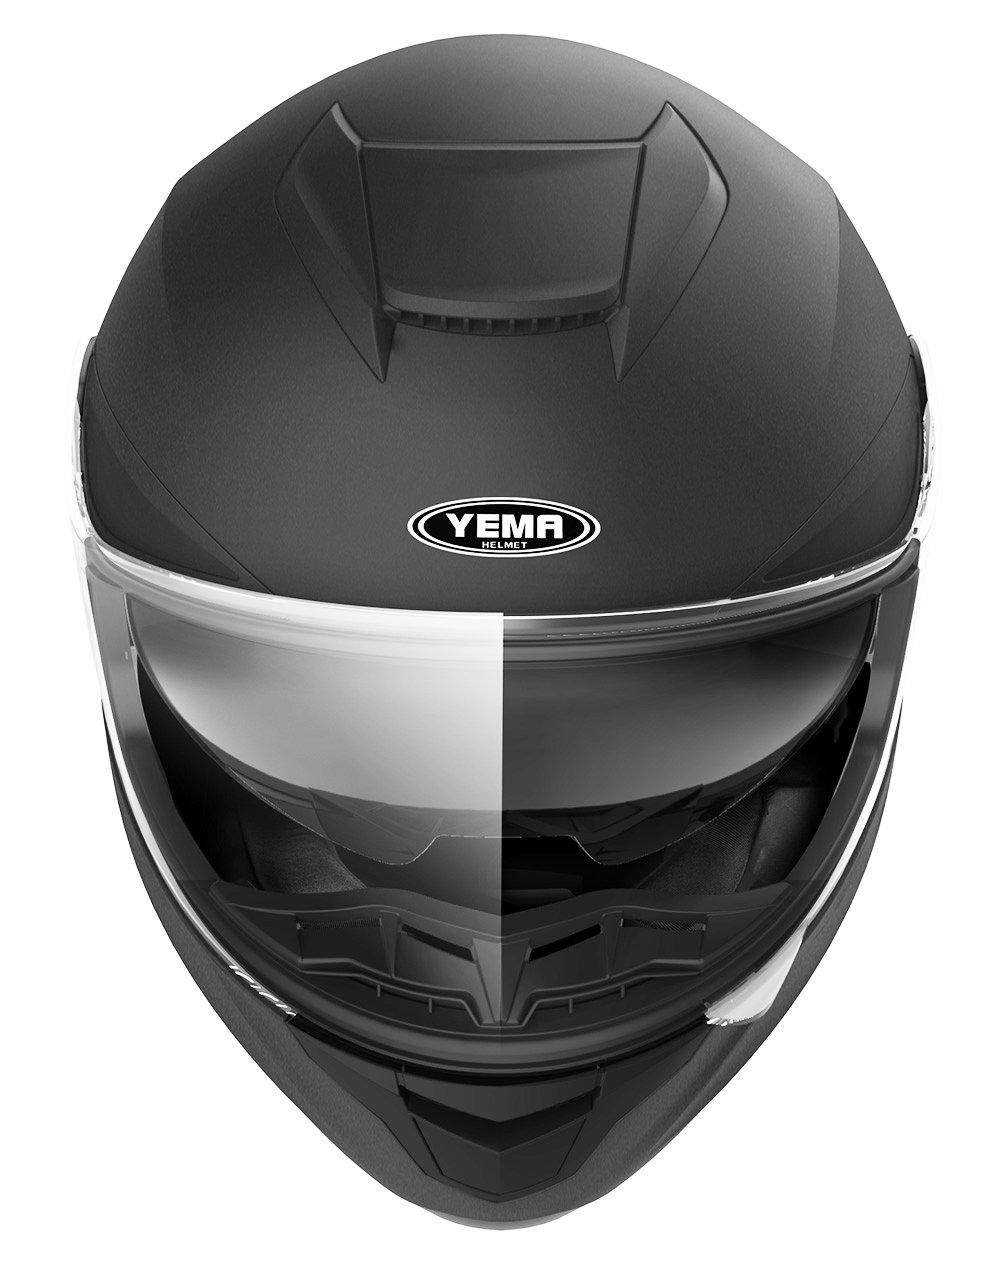 Matte Black,Medium YEMA YM-831 Motorbike Street Bike Racing Crash Helmet with Sun Visor for Adult Men and Women Motorcycle Full Face Helmet DOT Approved